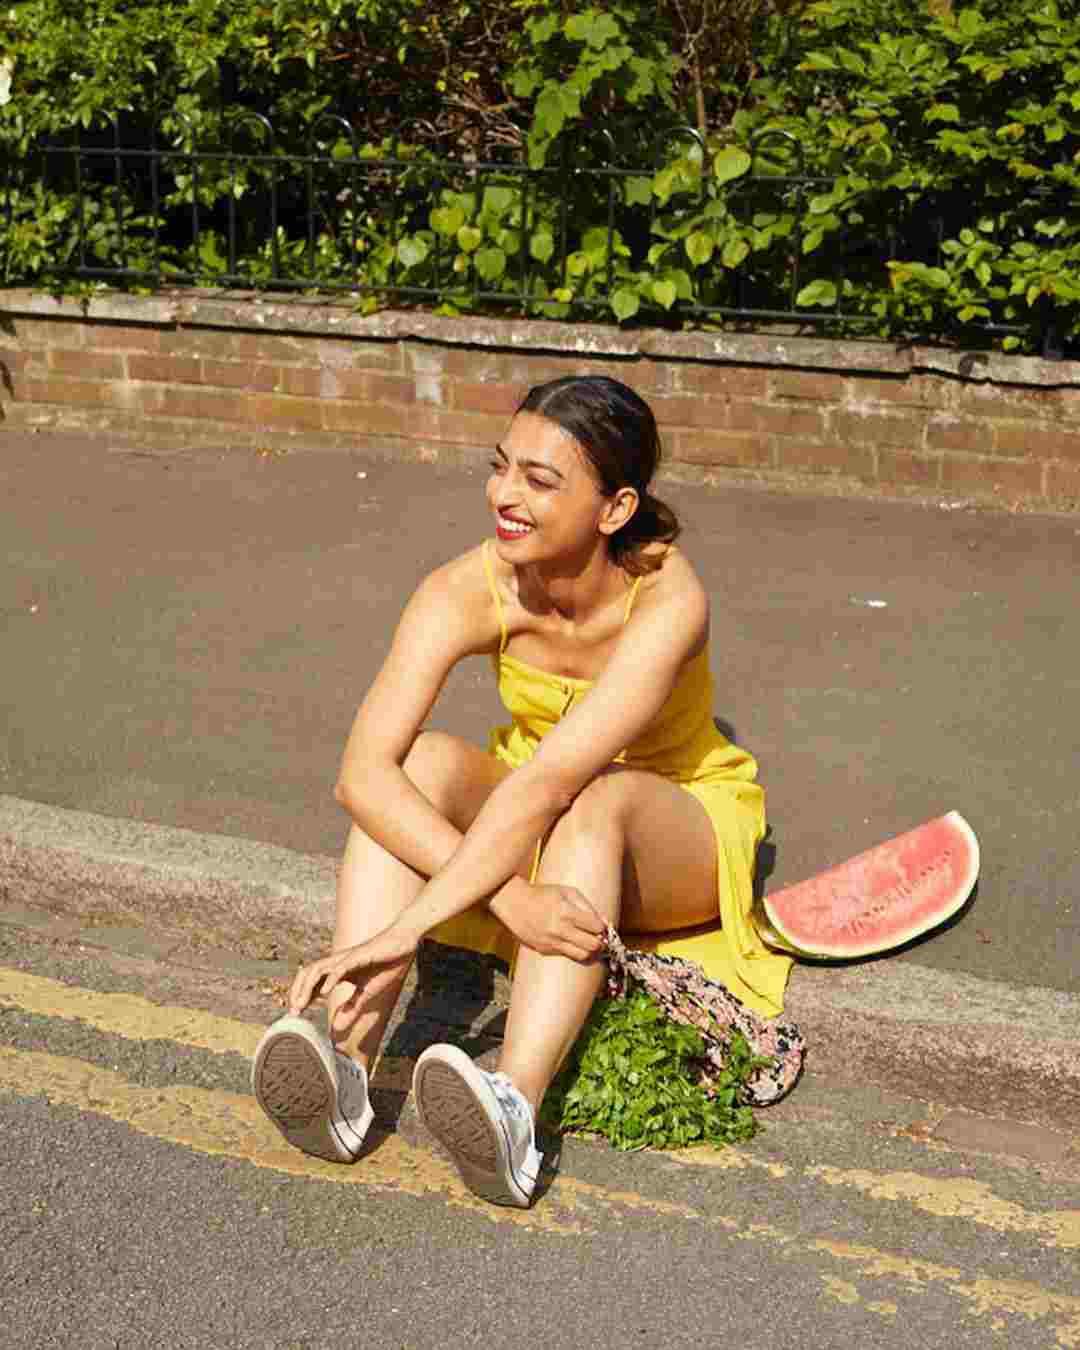 Bollywood Hot Heroine Radhika Apte Instagram Photos